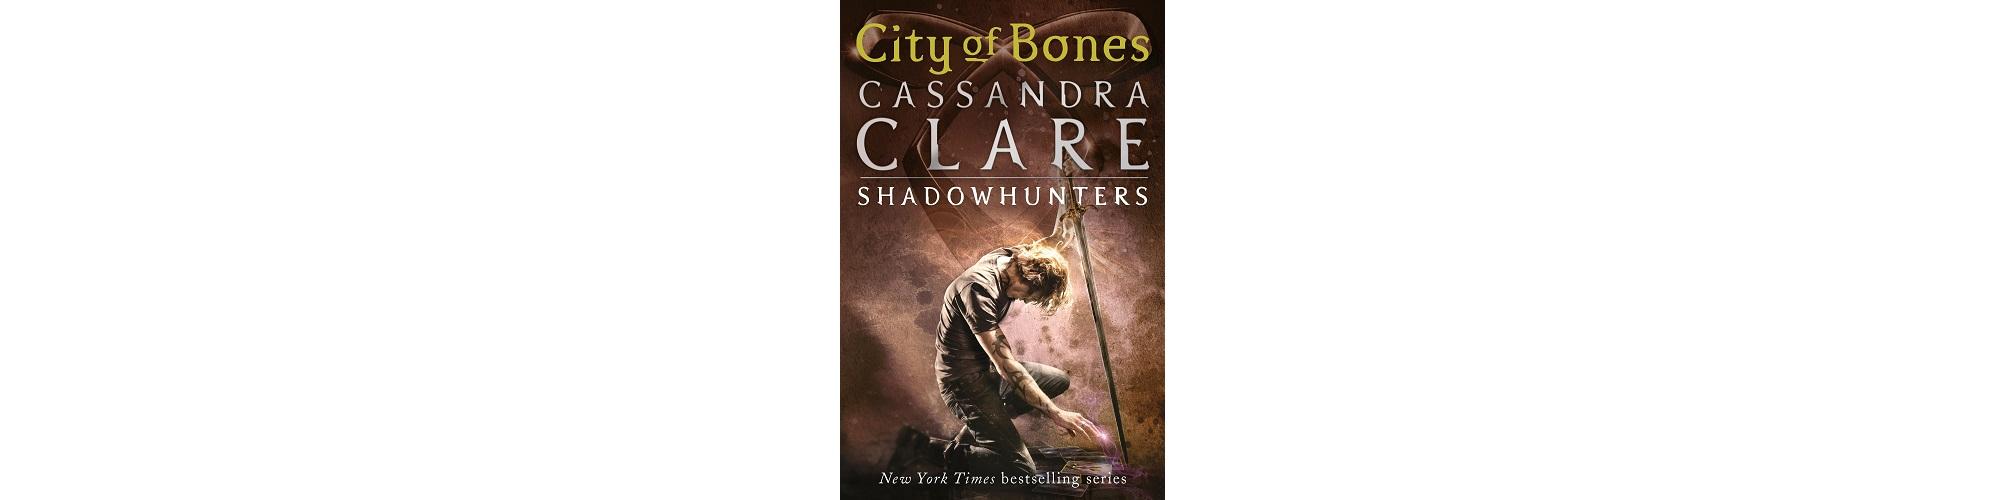 City of Bones by Cassandra Clare book cover